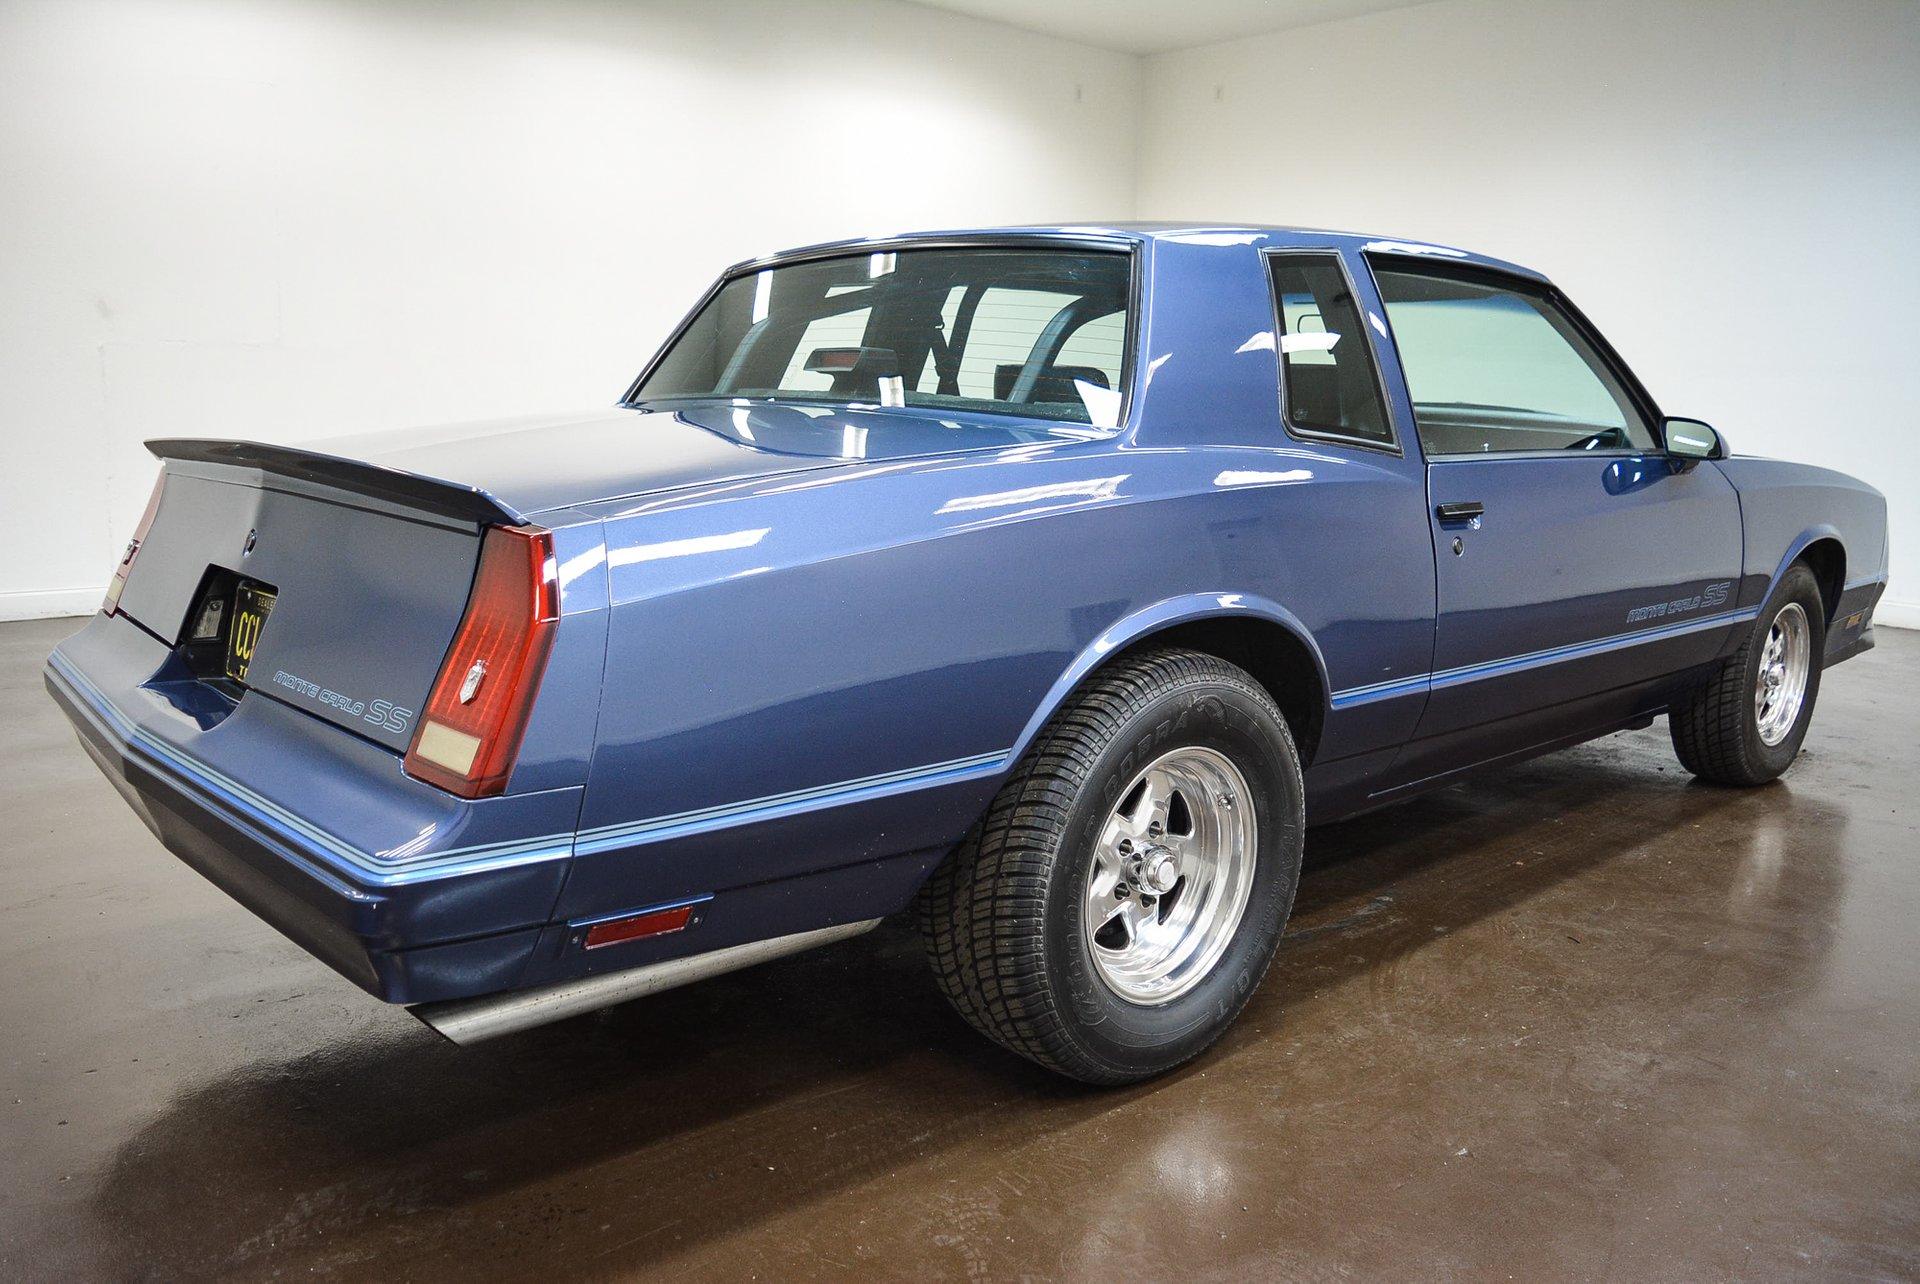 1987 Chevrolet Monte Carlo | Classic Car Liquidators in Sherman, TX